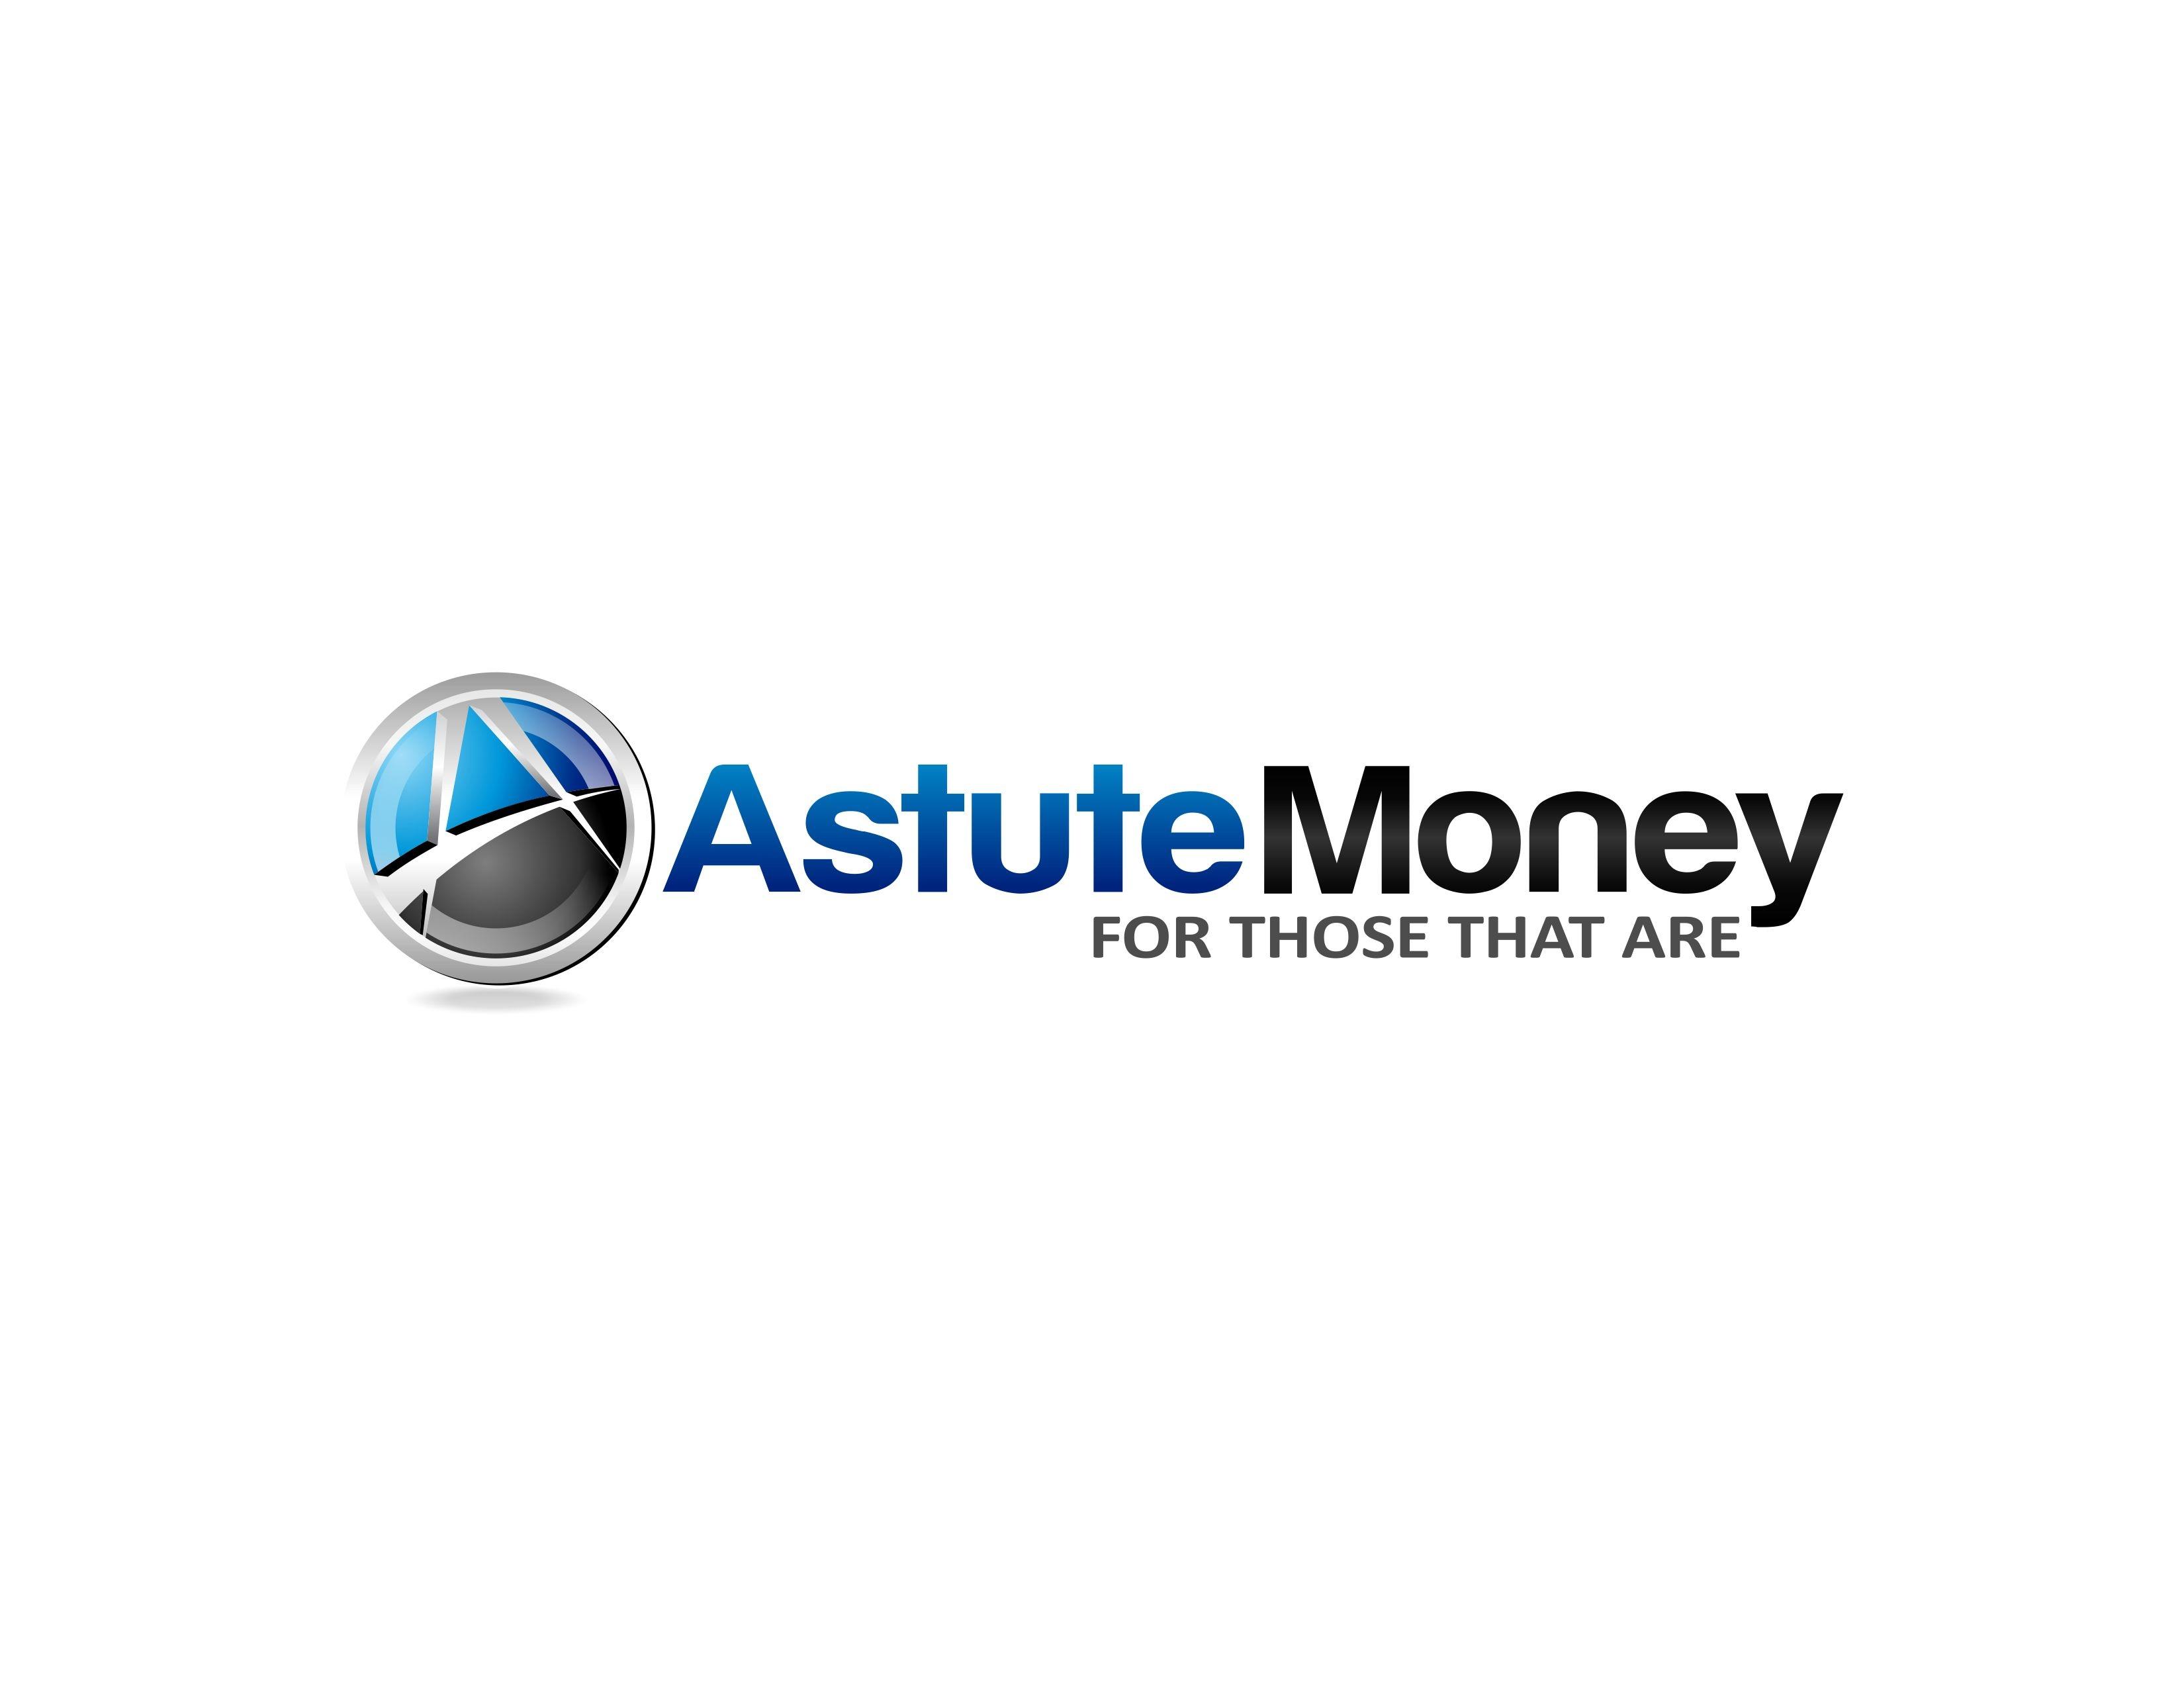 Astute Money Financial Planning Ltd.